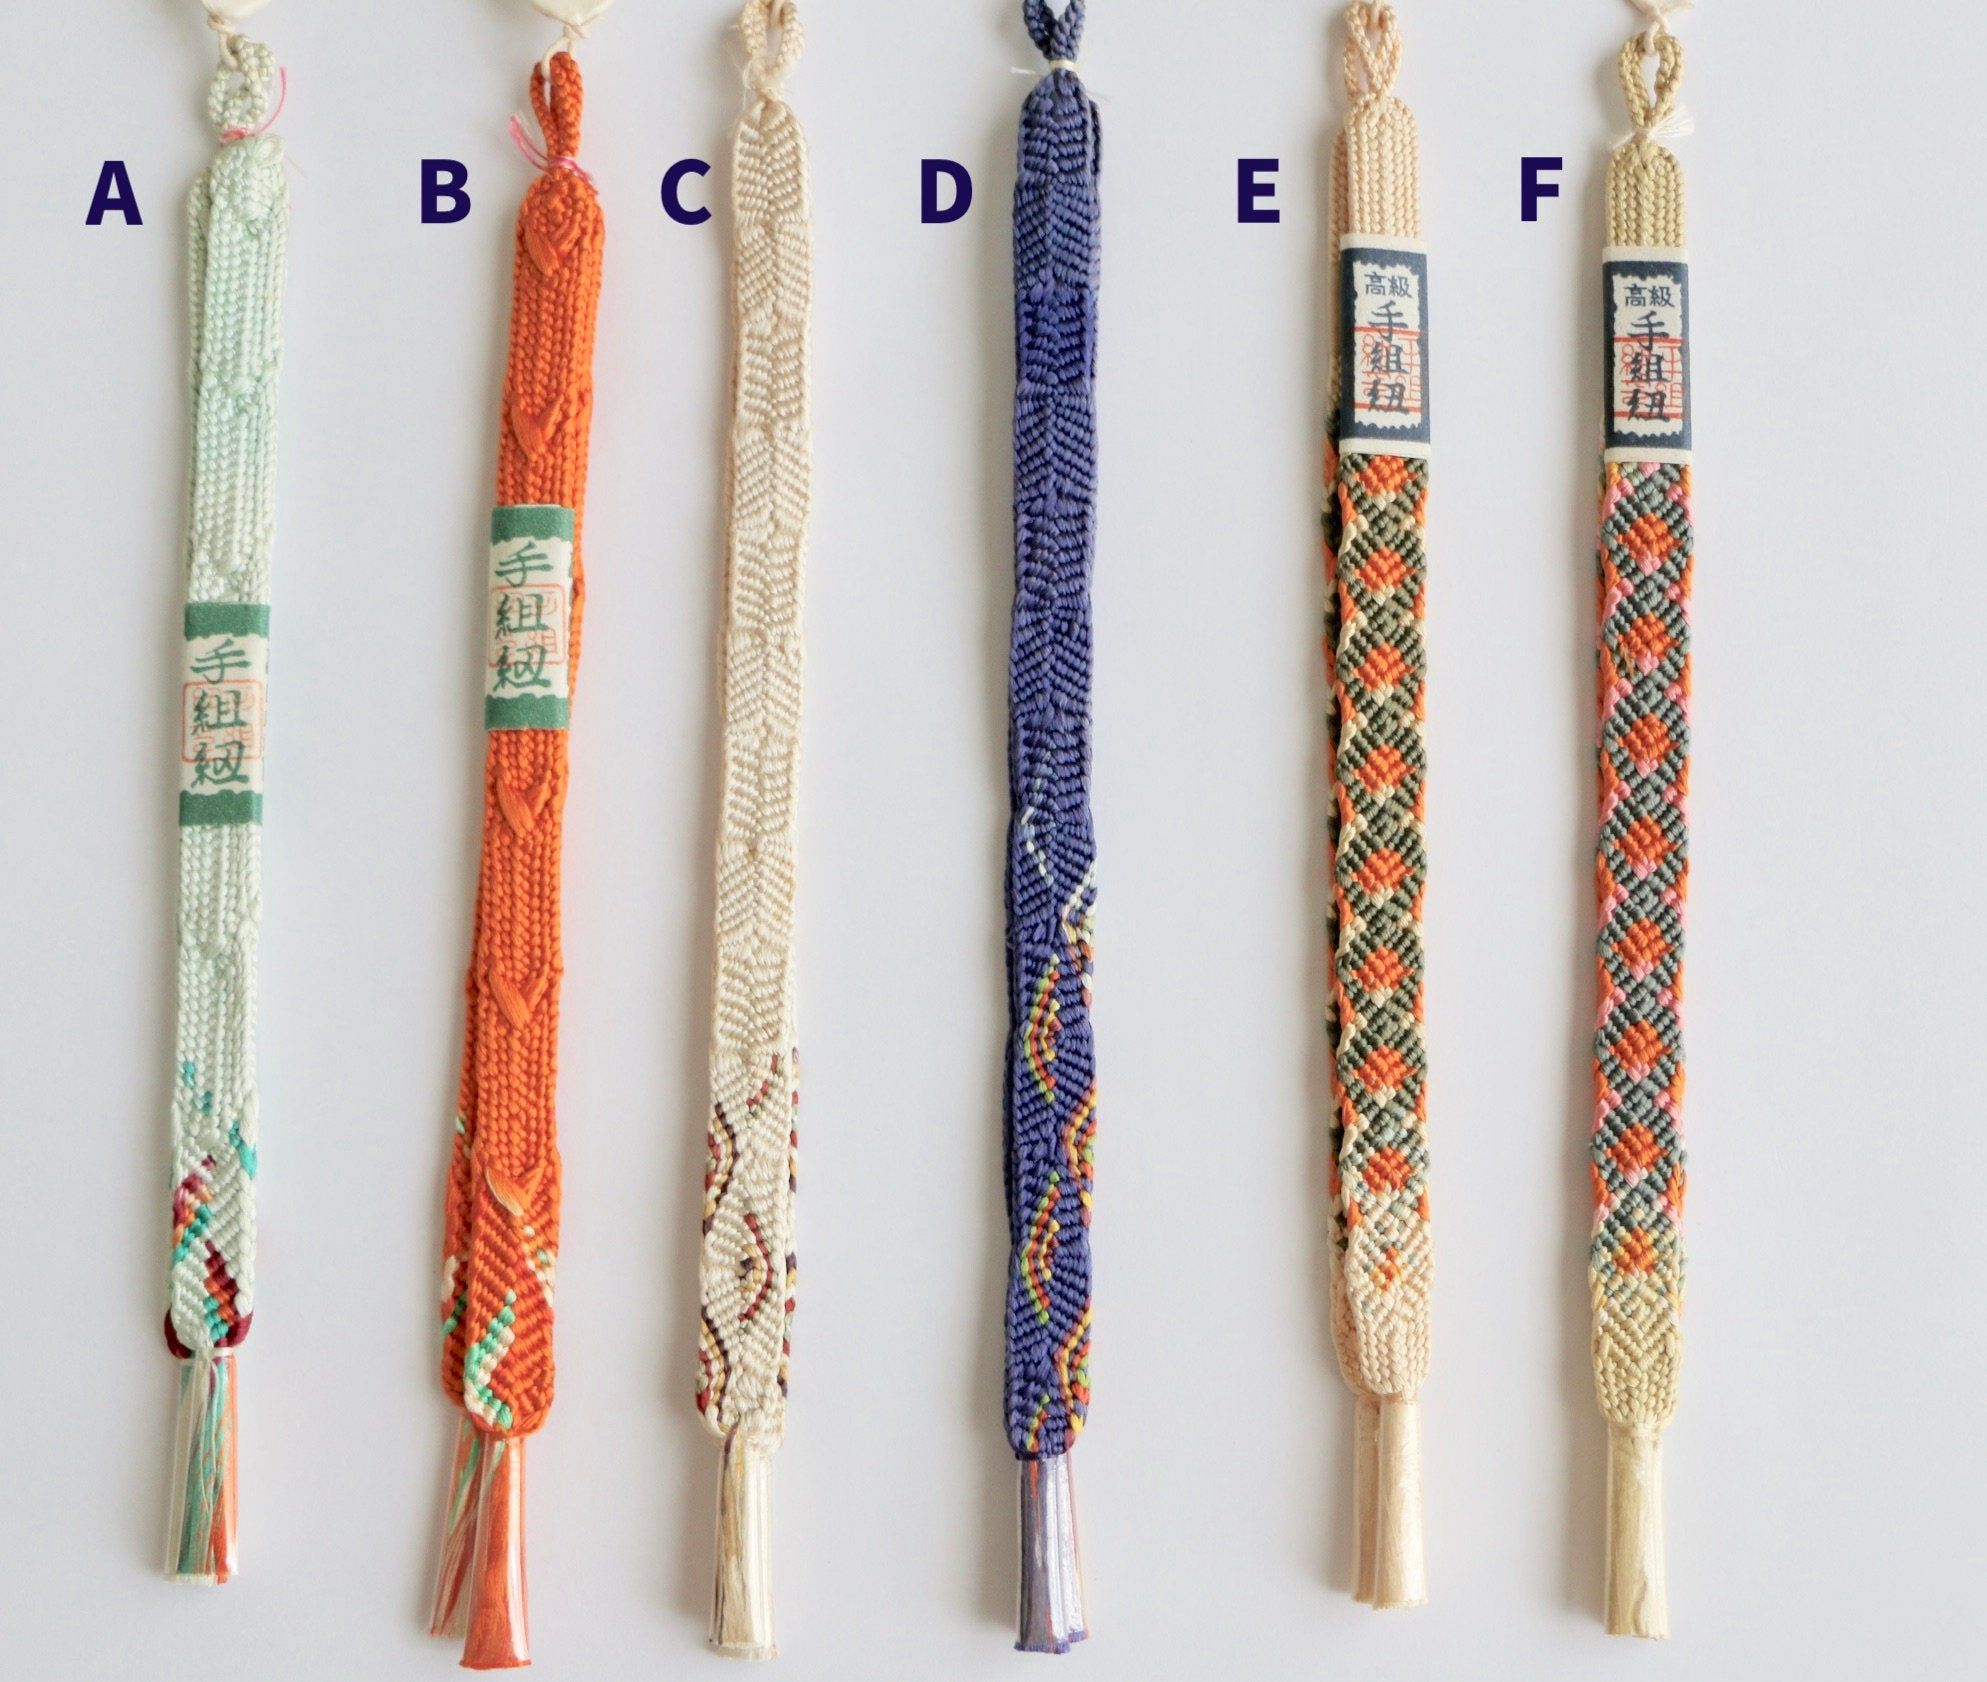 New haorihimo Haorihimo  Haori strings Vintage Haori-himo Kimono accessories, Haori himo